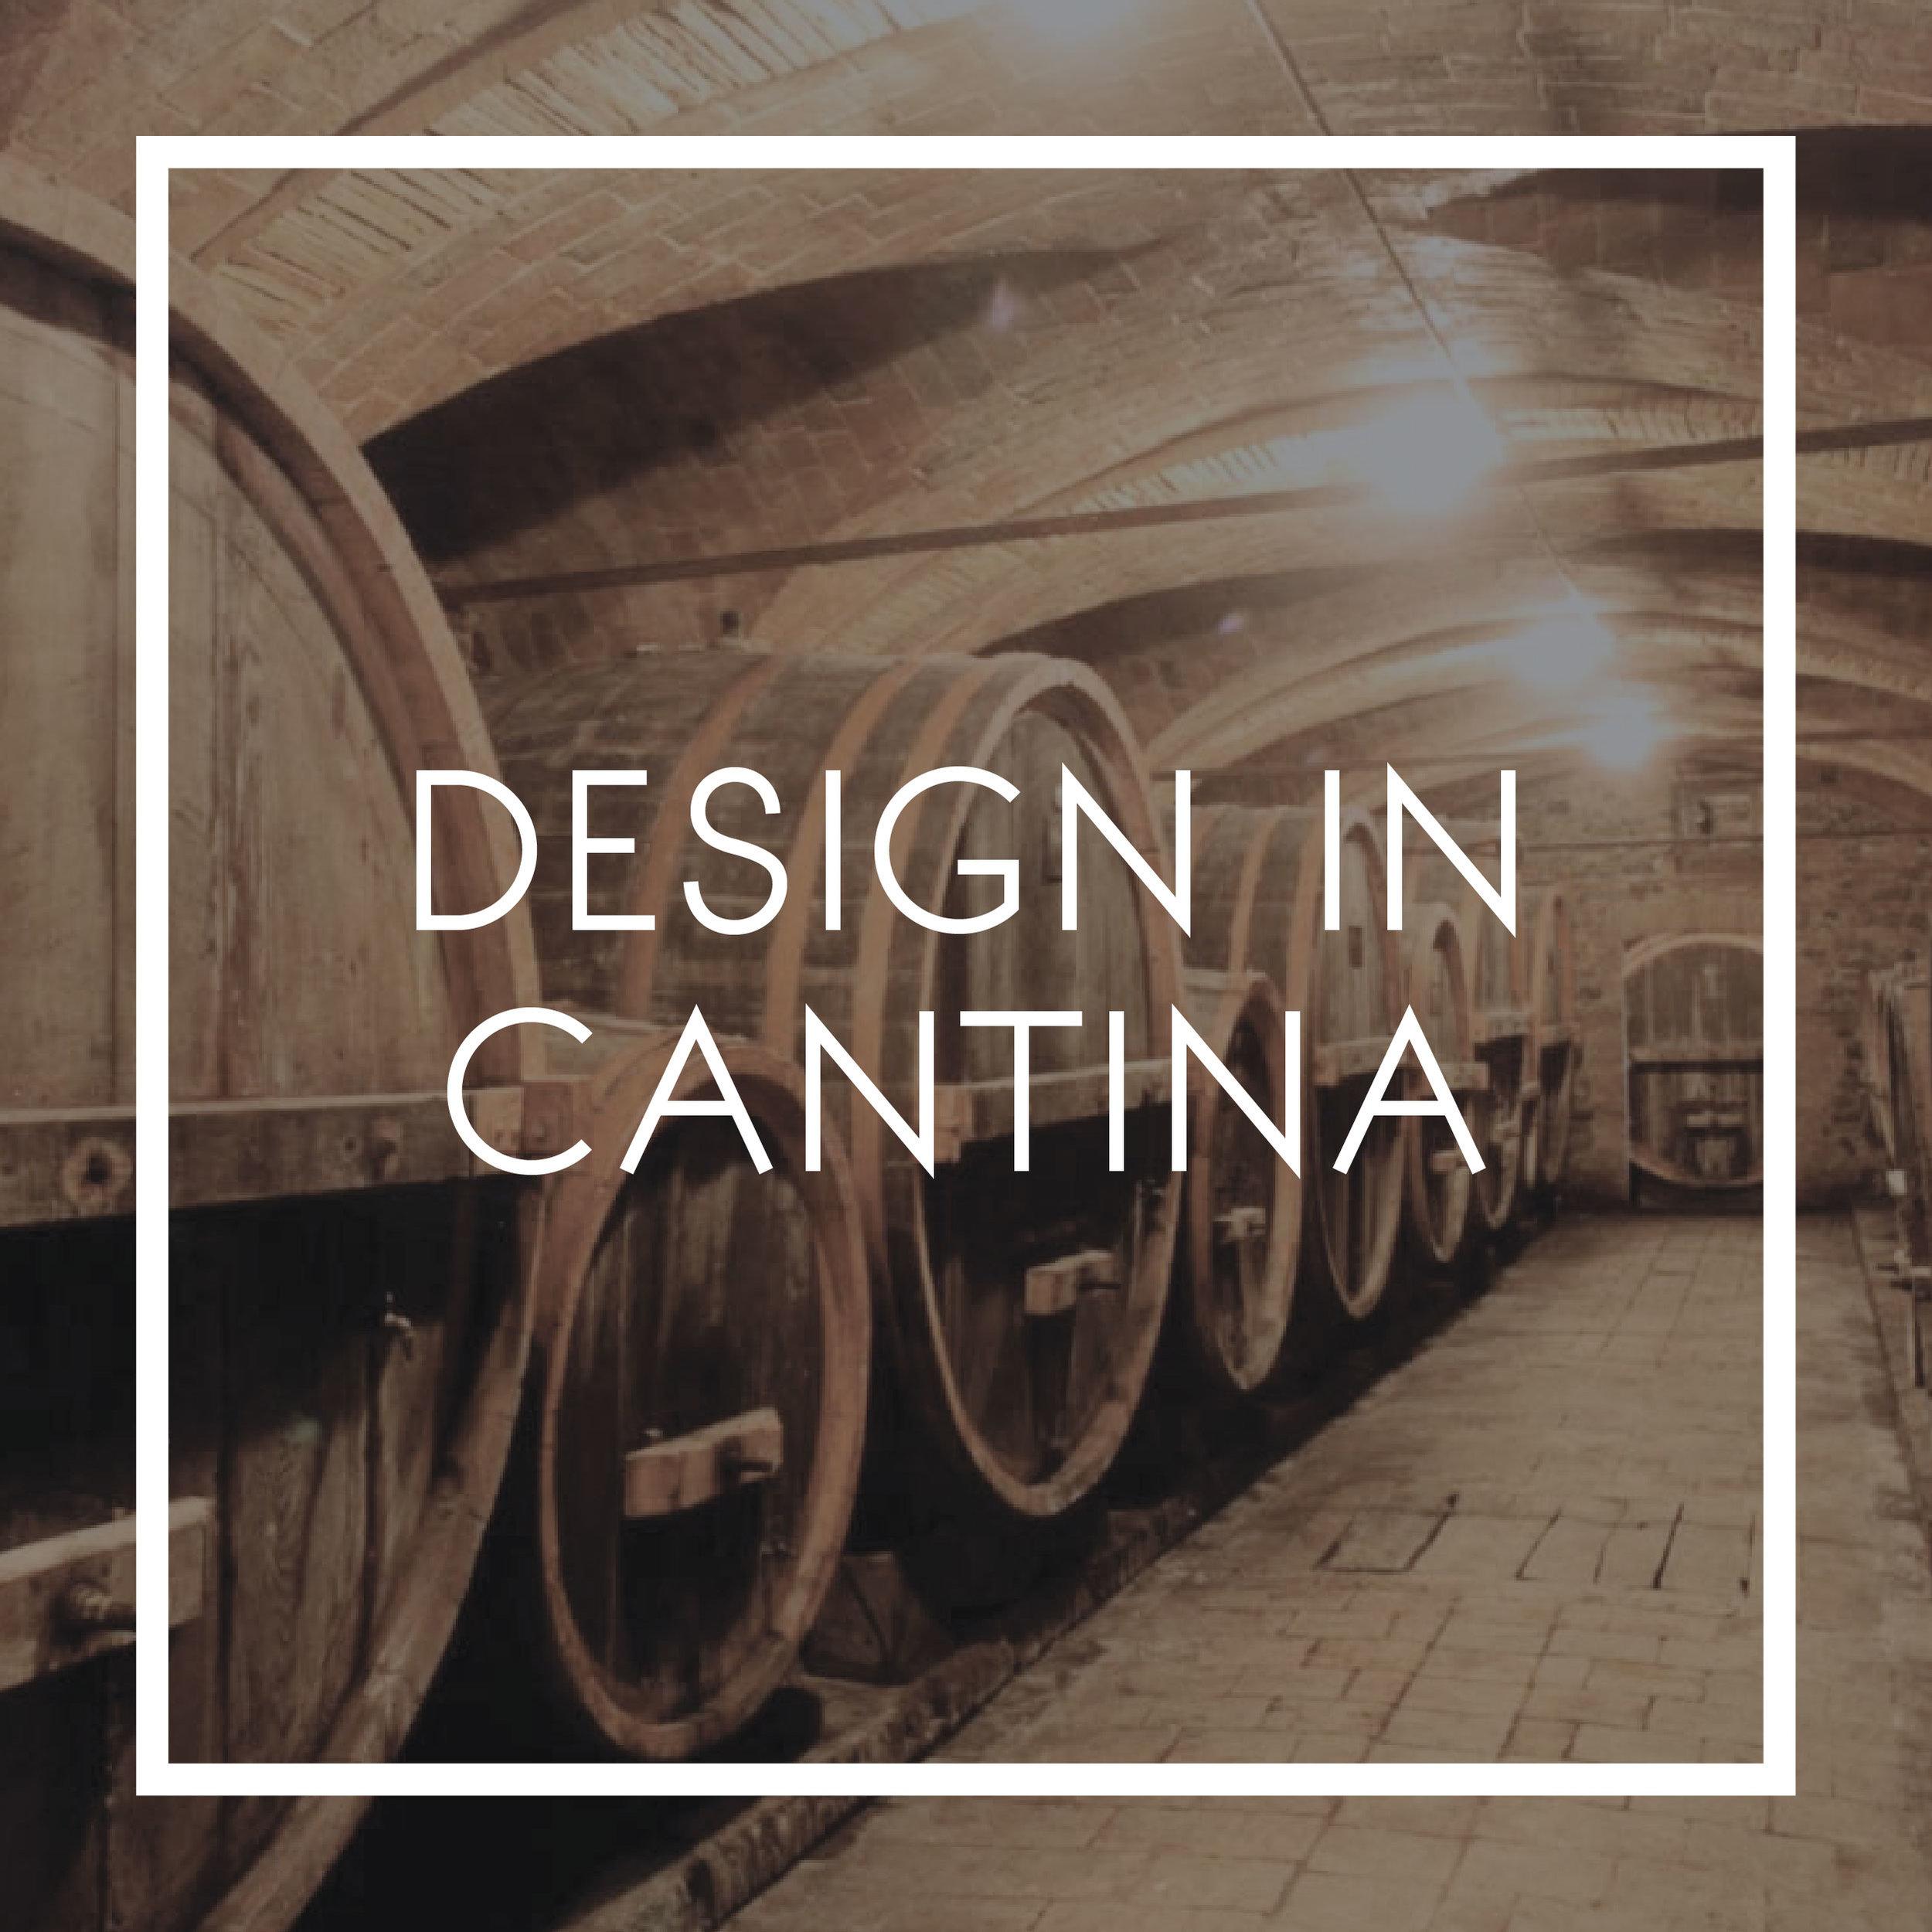 PERCORSI LANGHE ROERO ITINERARI TURISMO VISITA design in cantina.jpg